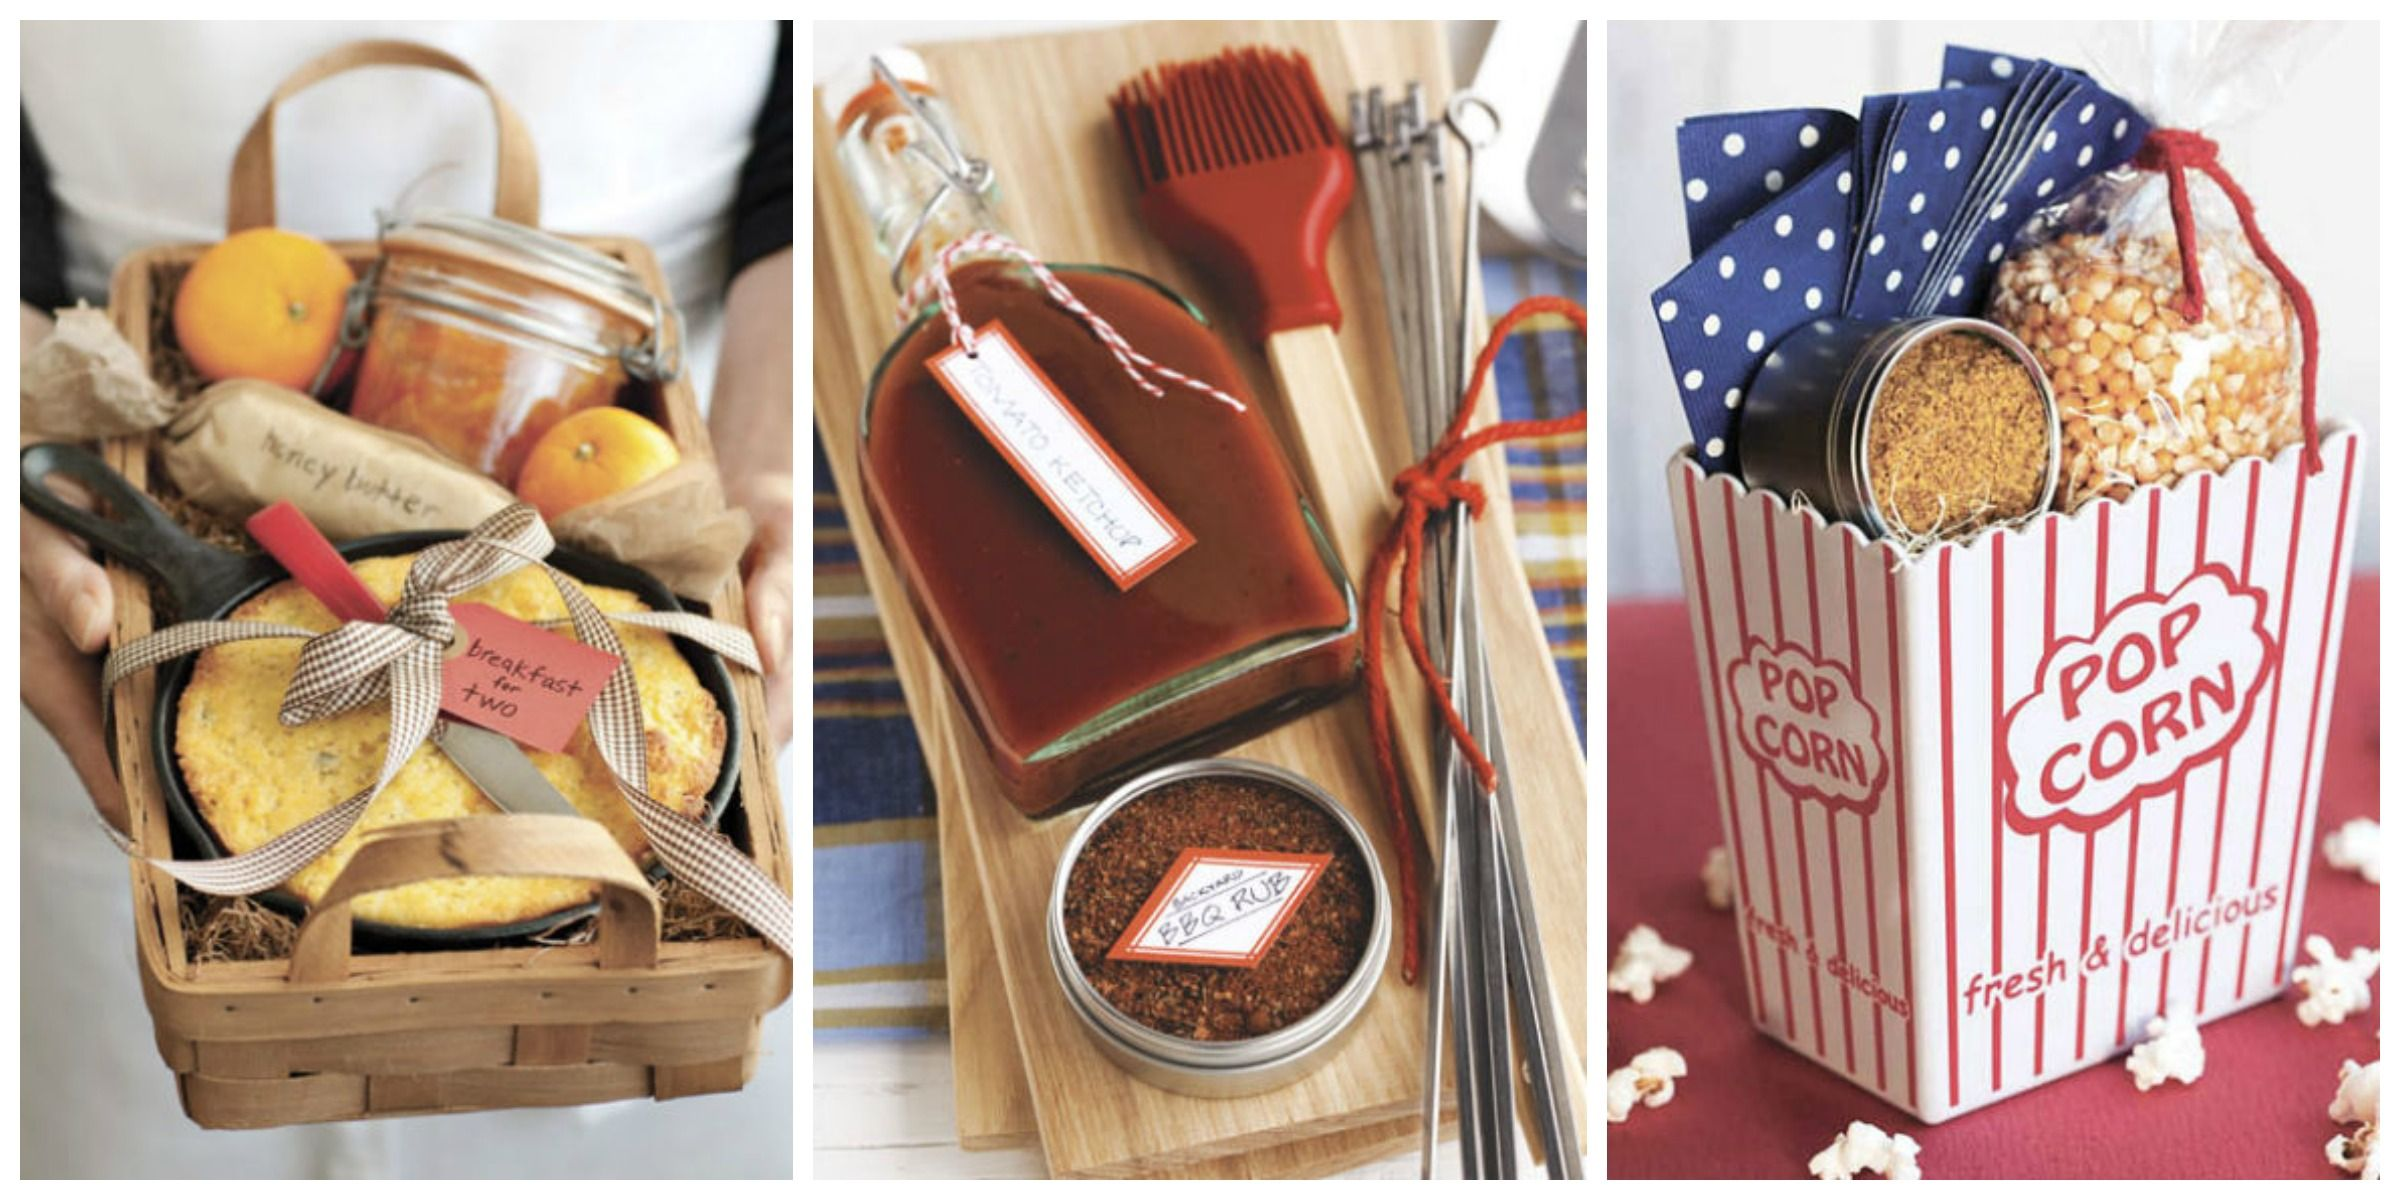 10 diy christmas gift basket ideas how to make your own holiday 10 diy christmas gift basket ideas how to make your own holiday gift baskets negle Gallery